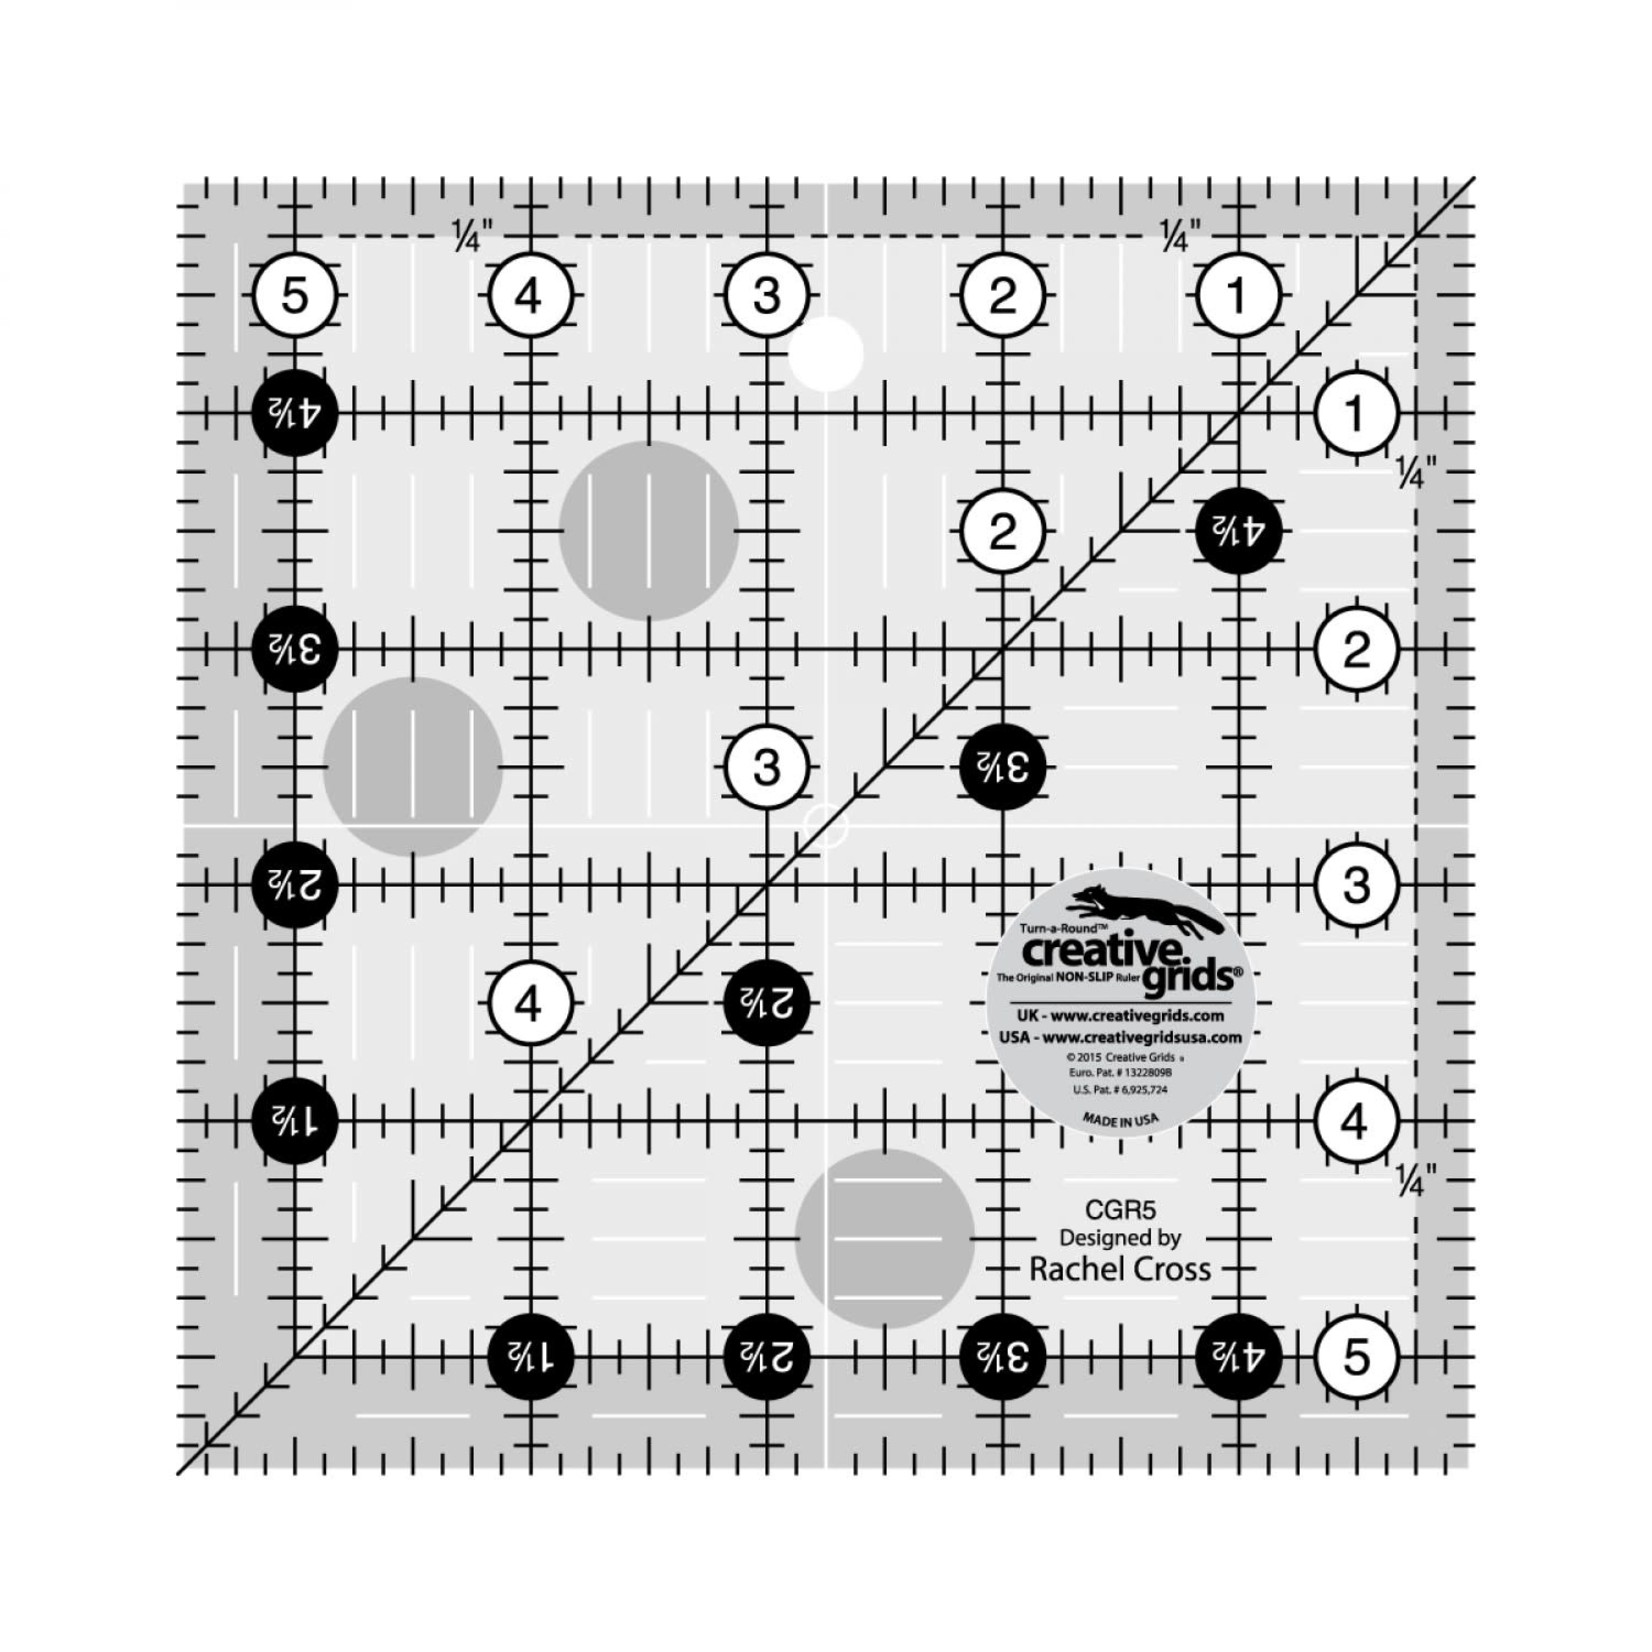 Creative Grids Creative Grids 5 1/2 X 5 1/2 Ruler CGR5